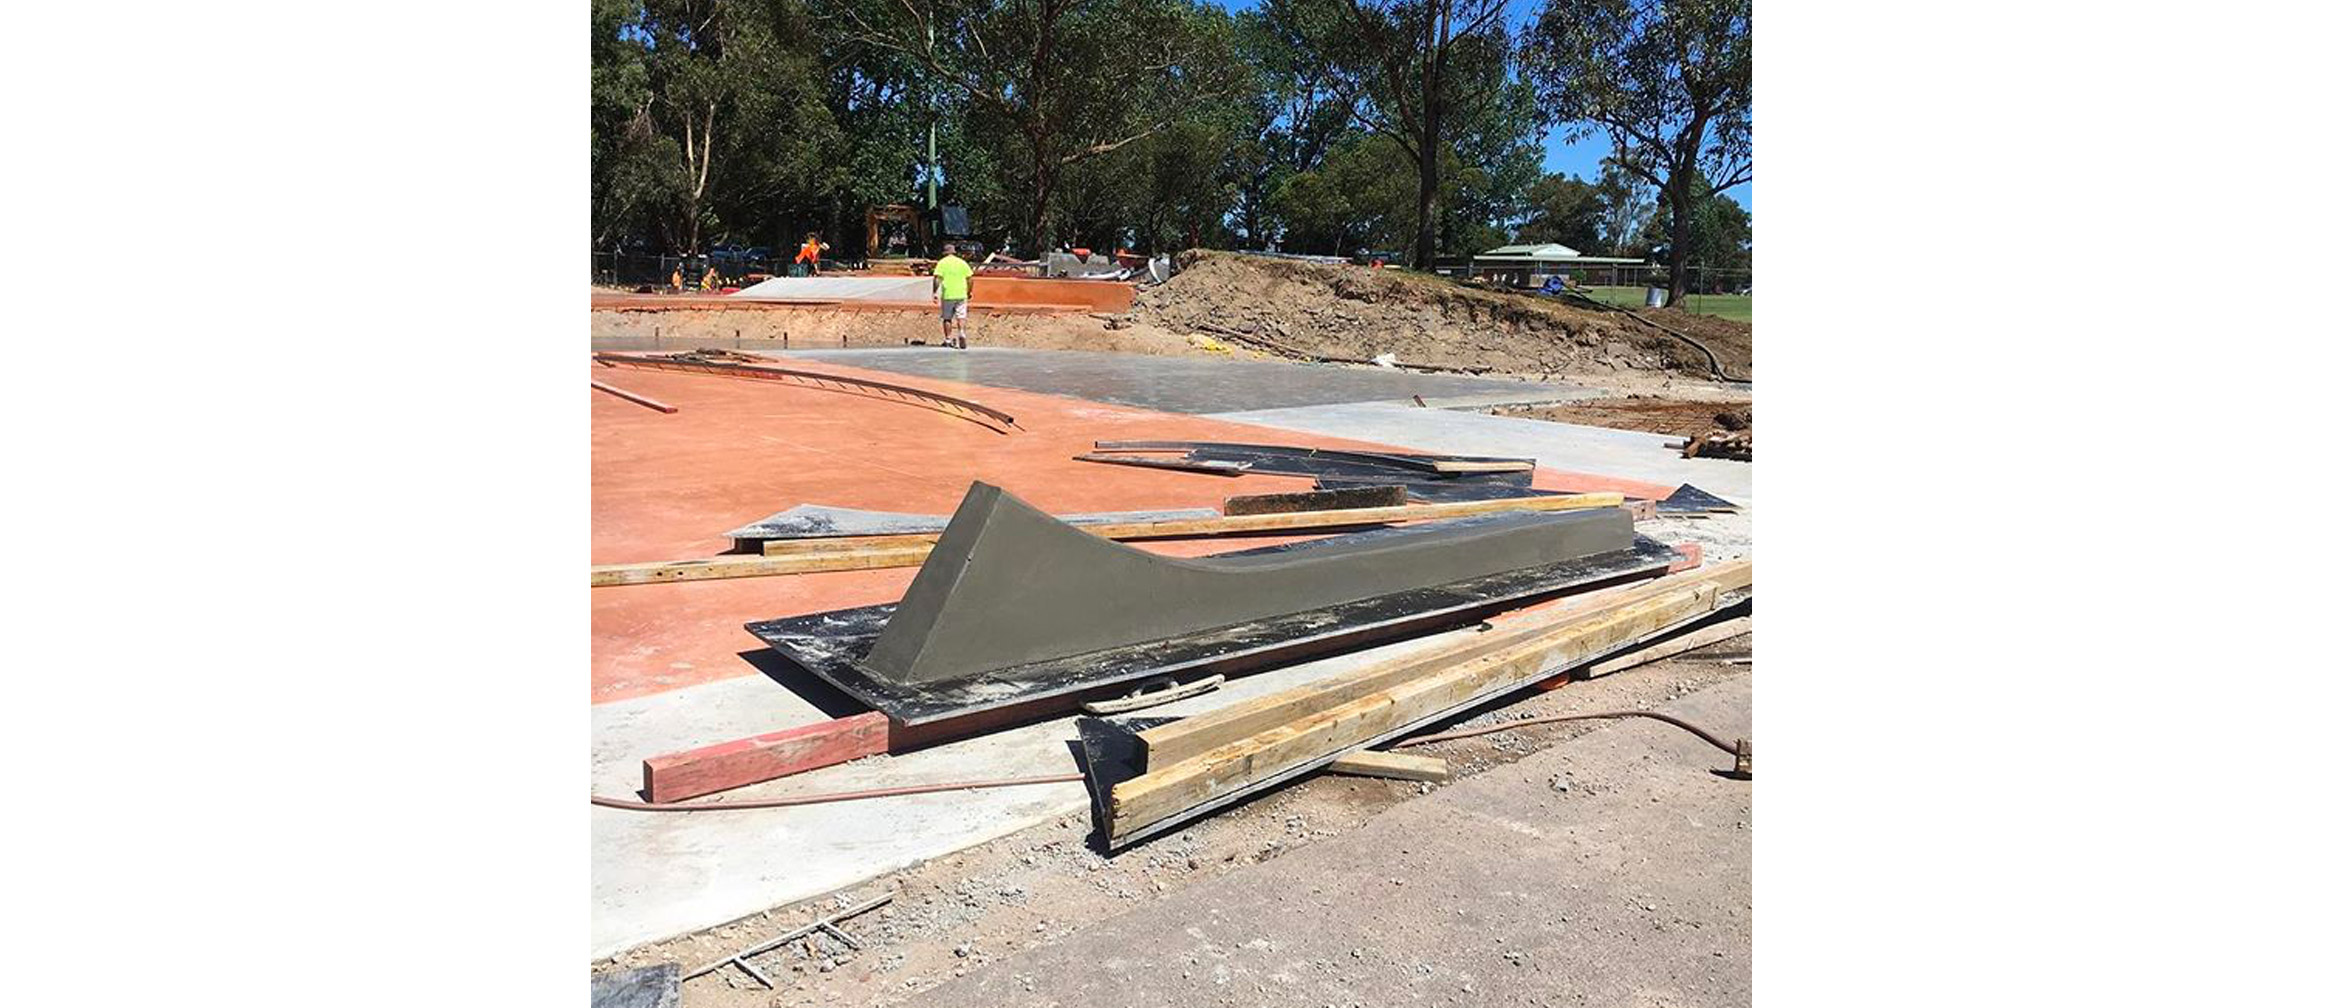 Cromer skate park construction